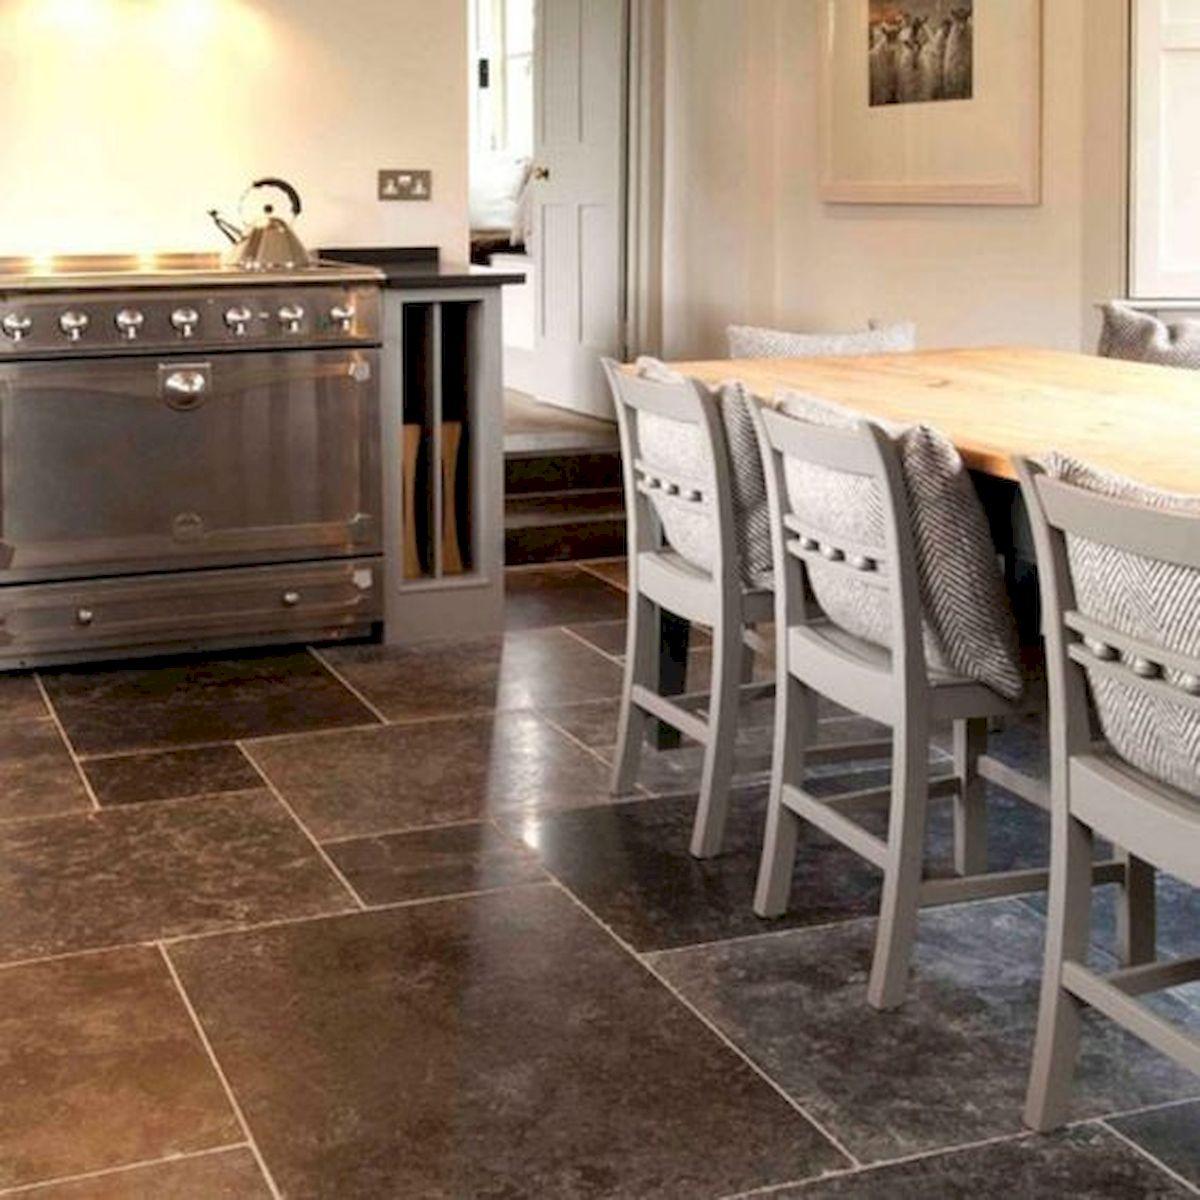 30 Best Kitchen Floor Tile Design Ideas With Concrete Floor Ideas (2)